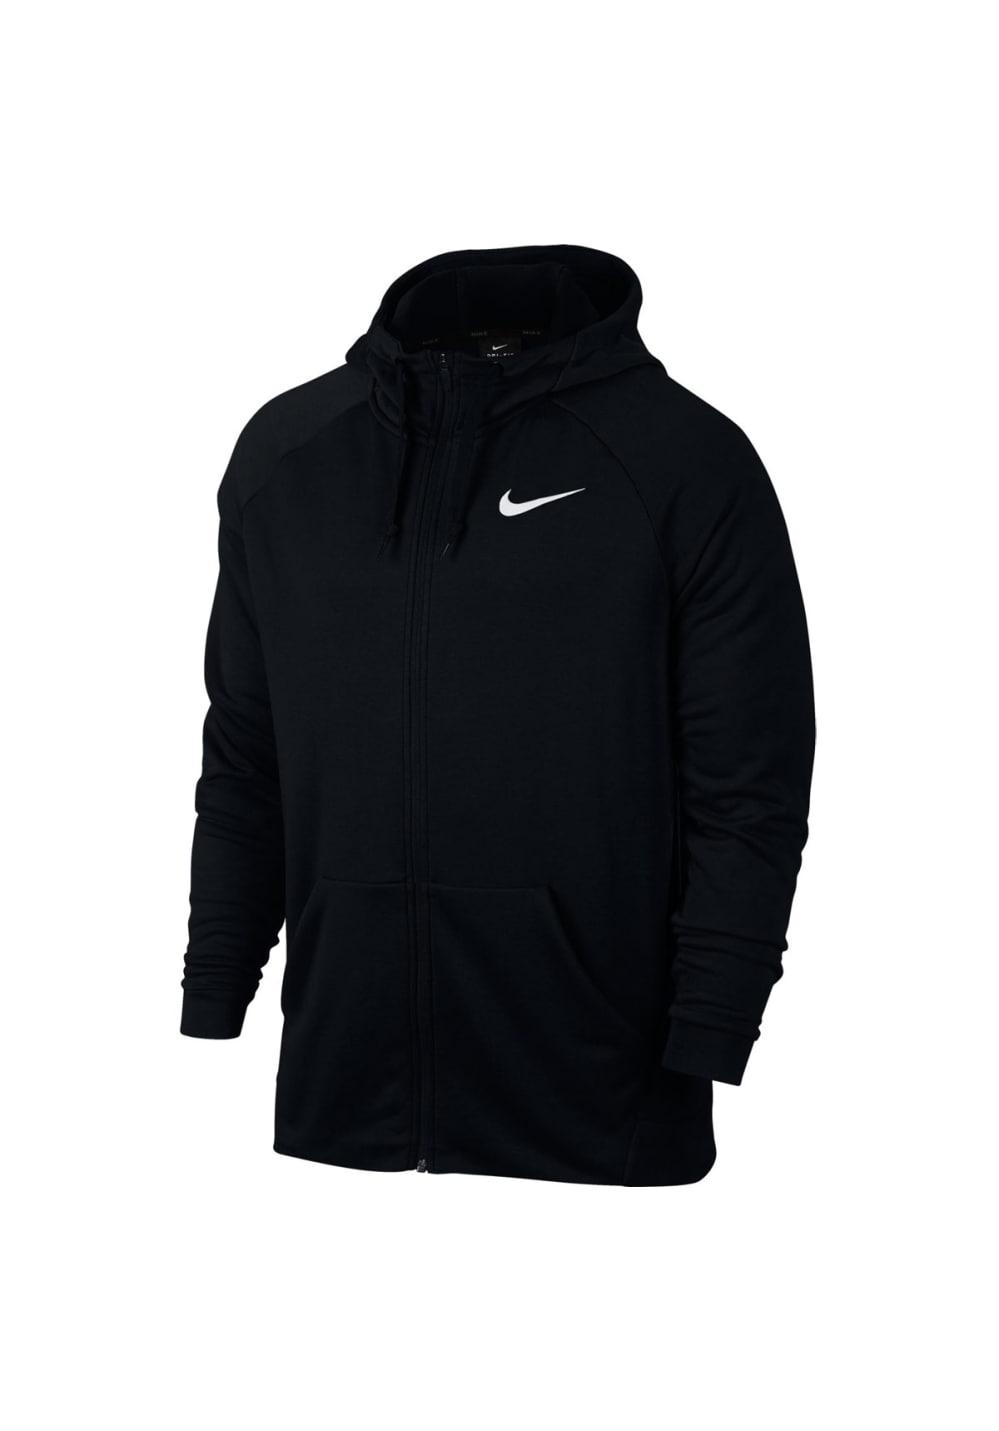 Nike Dry Training Hoodie - Sweatshirts & Hoodies für Herren - Schwarz